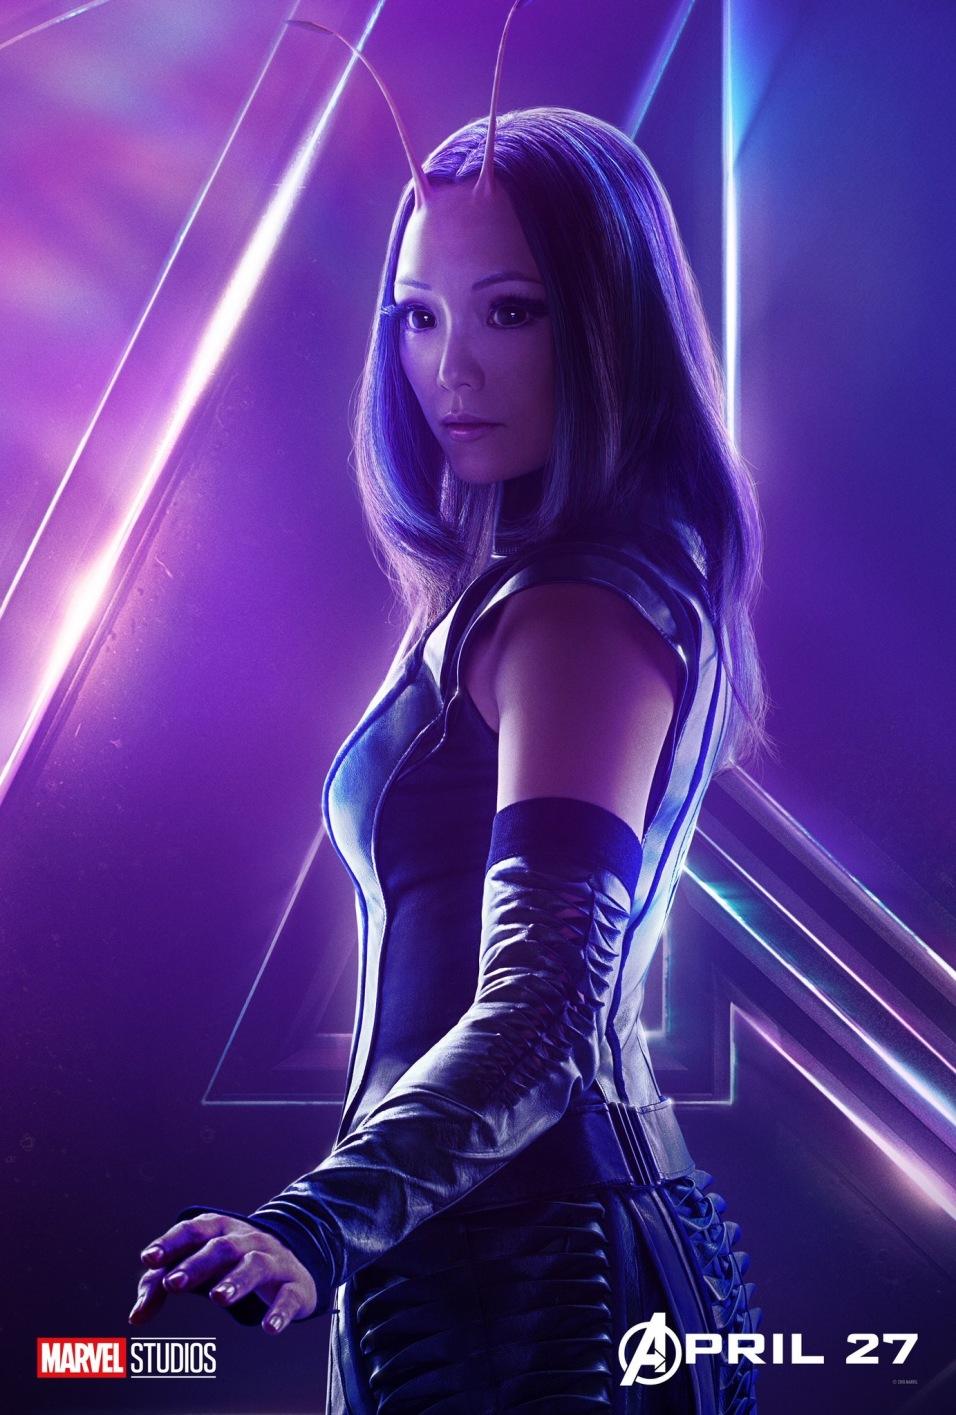 Avengers Infinity War Posters - Mantis